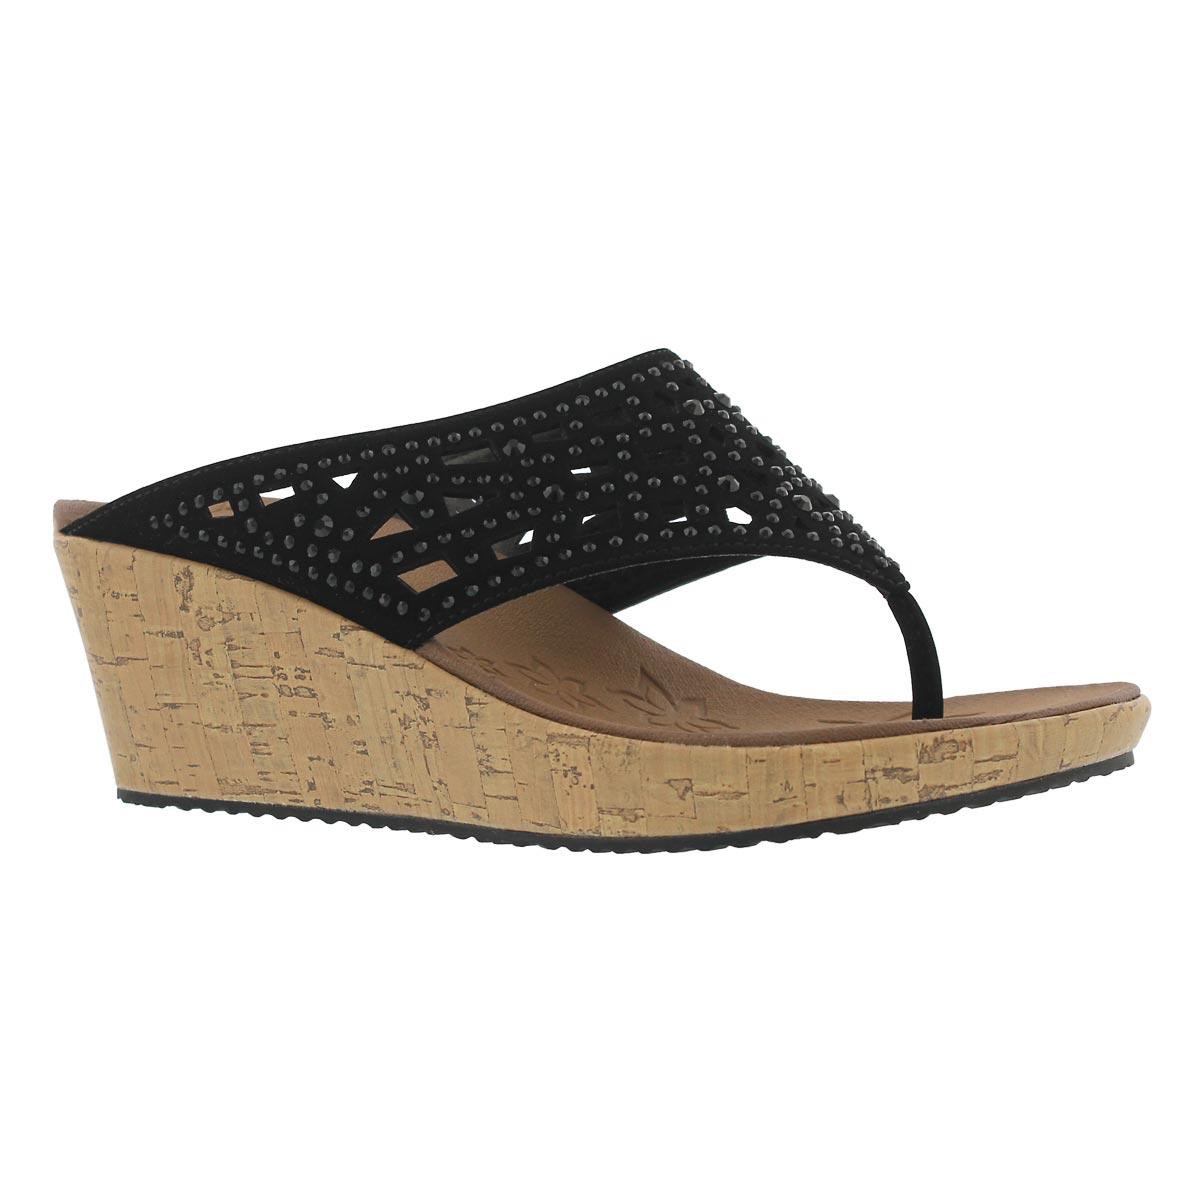 ff53df23a03a5a Skechers Women s BEVERLEE DAZZLED blk thong wedge sandals Women s Sandals  Black. 14% OFF. Lds Beverlee Dazzled blk thng wdg sndl